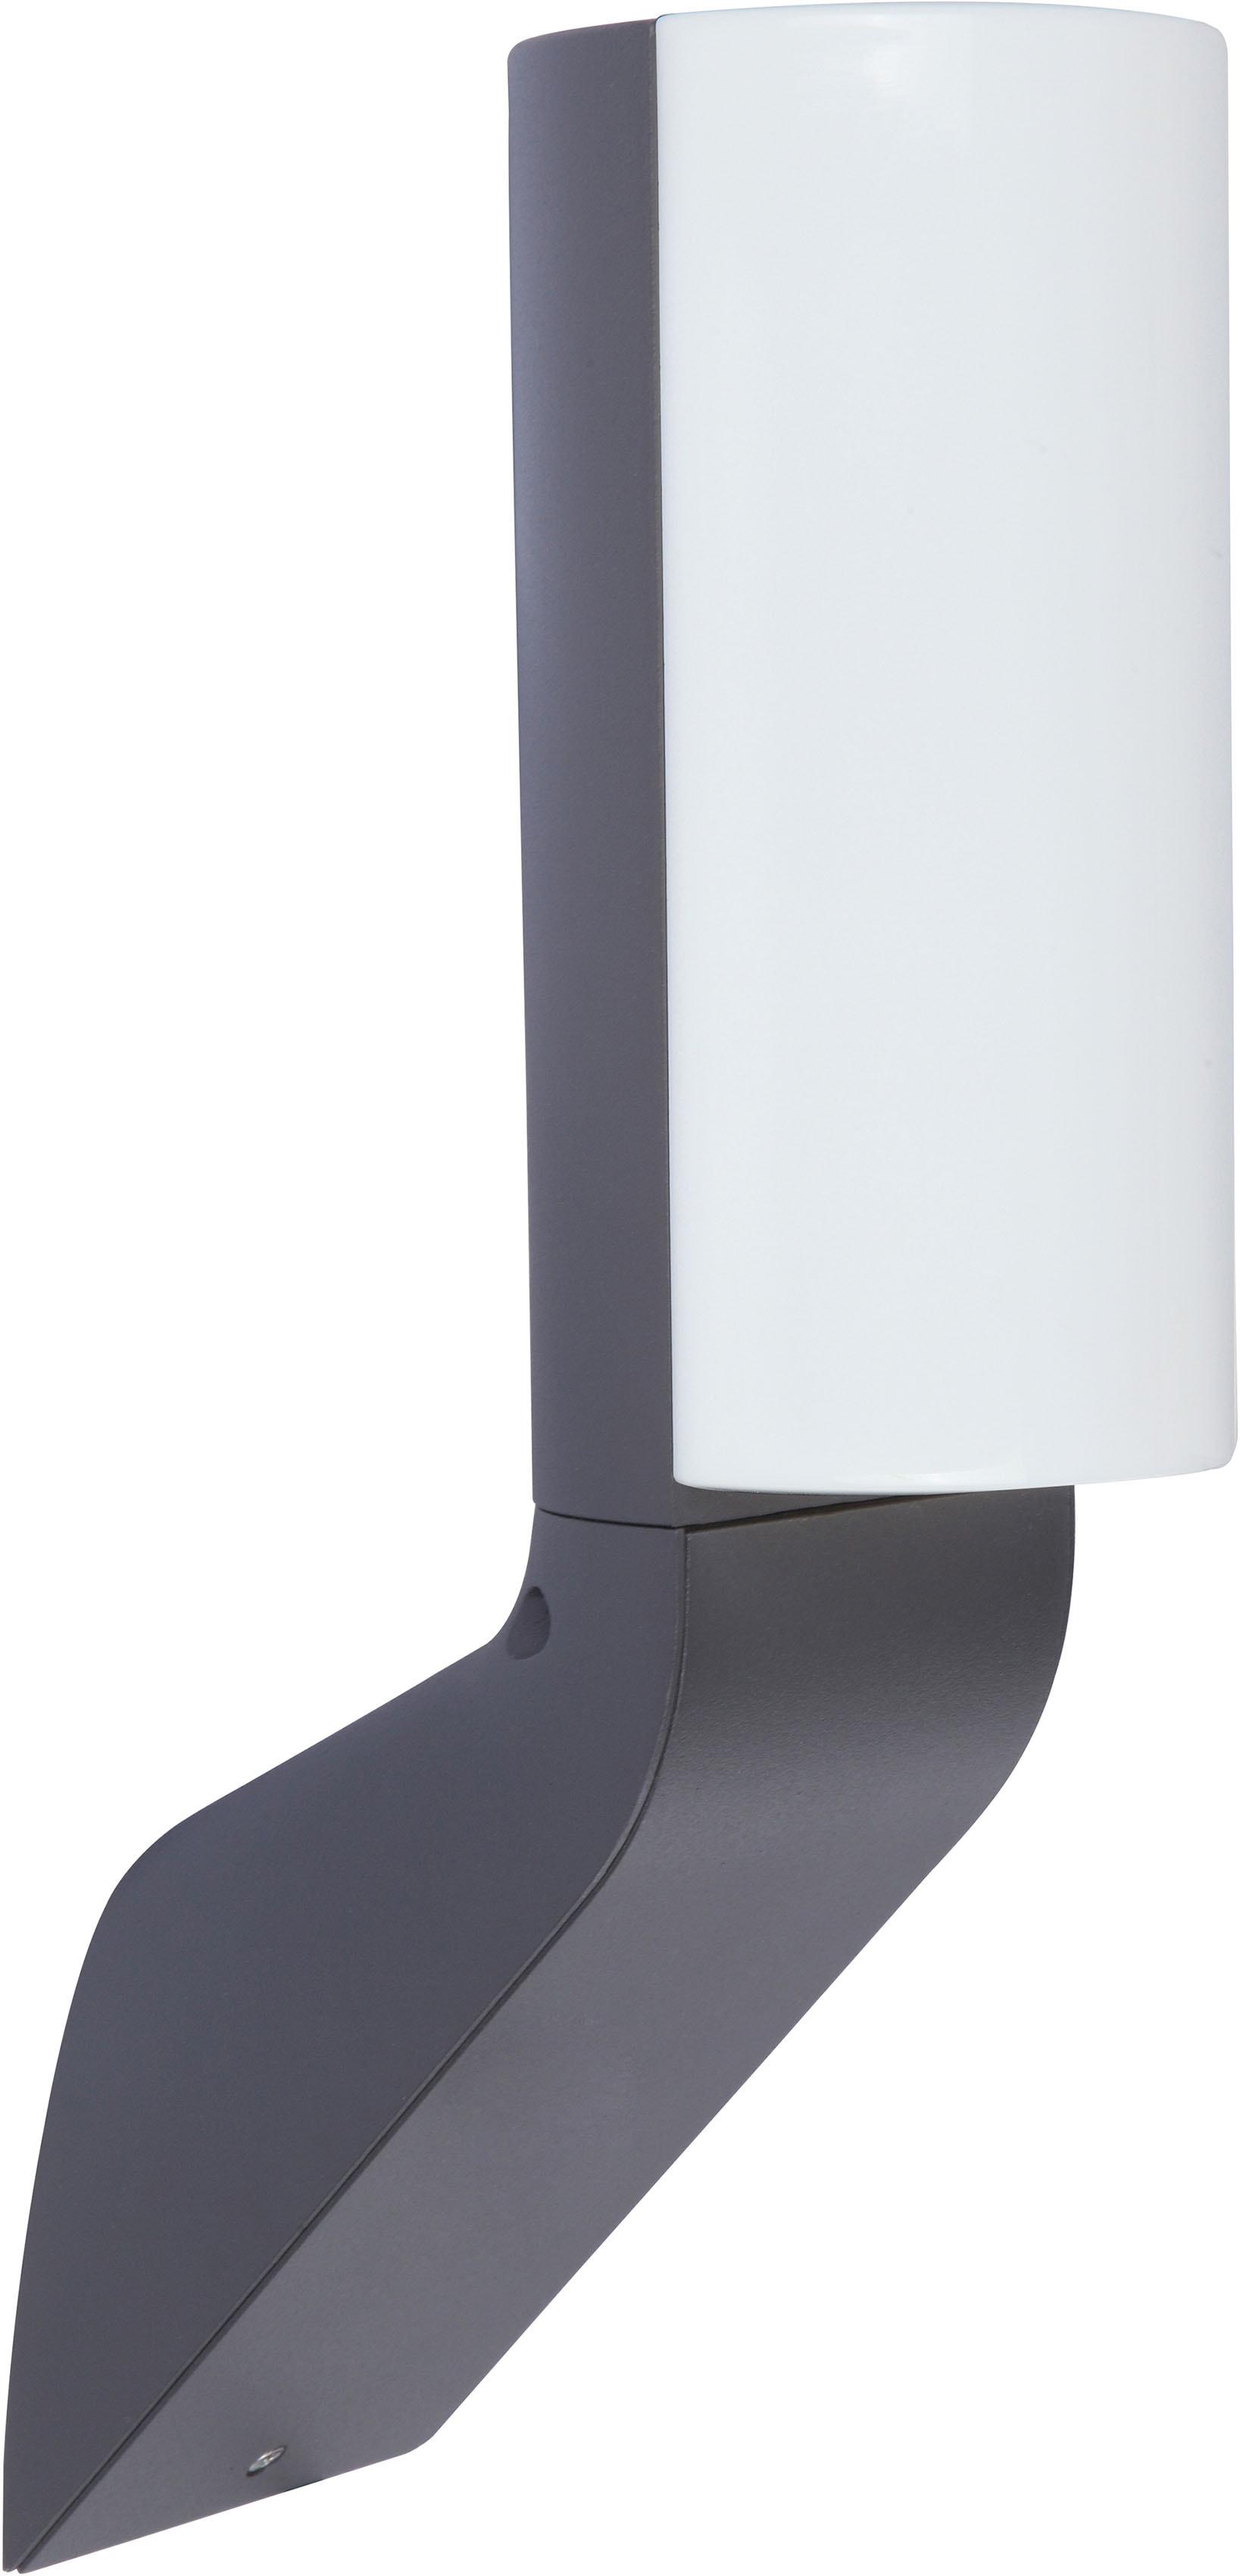 LUTEC LED Außen-Wandleuchte BATI 5188601125, LED-Modul, 1 St., Neutralweiß